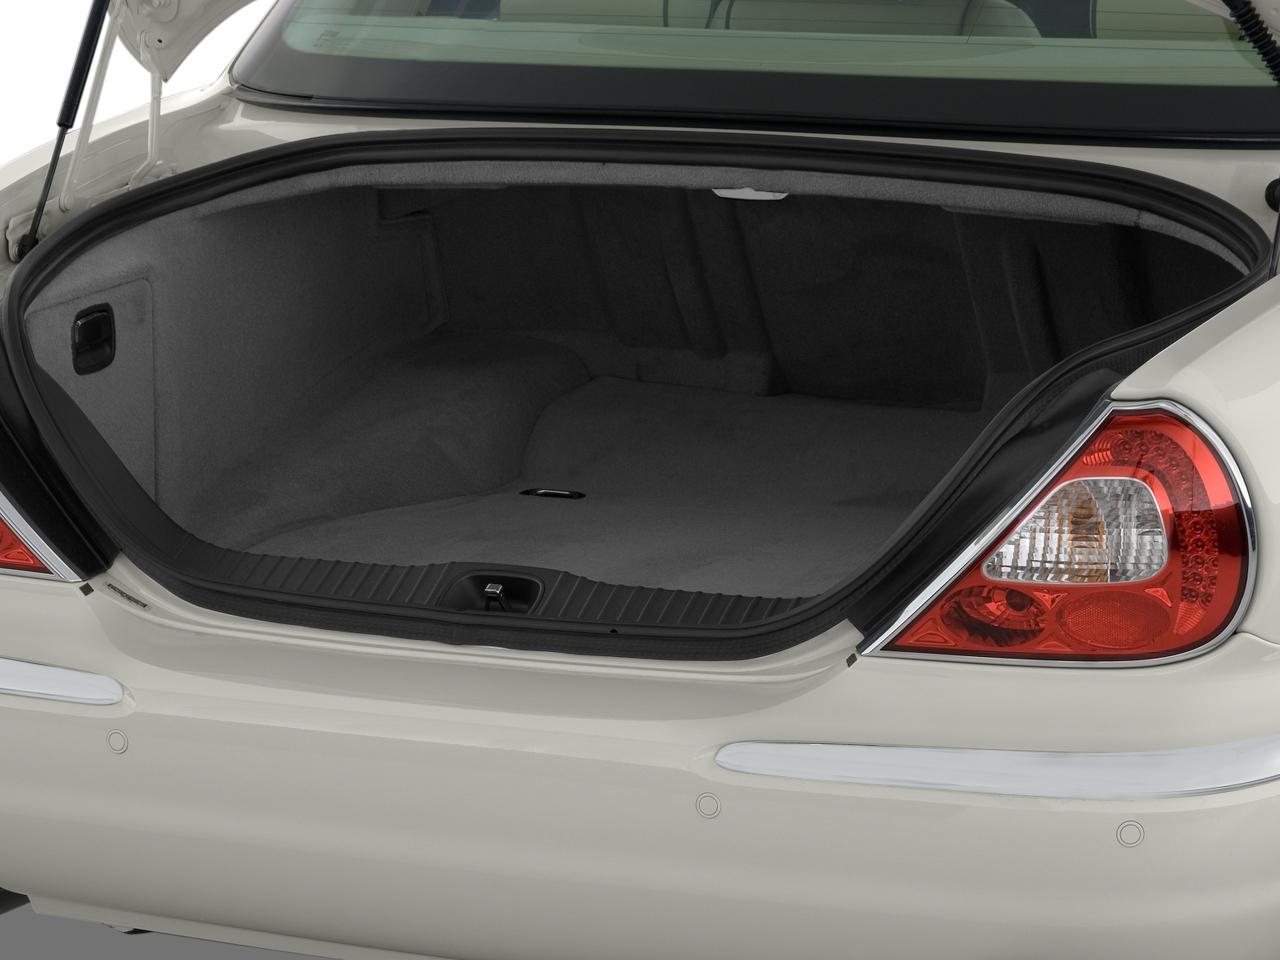 2008 Jaguar Xj Vanden Plas Luxury Sedan Review Automobile 1997 Wiring Diagram 16 100